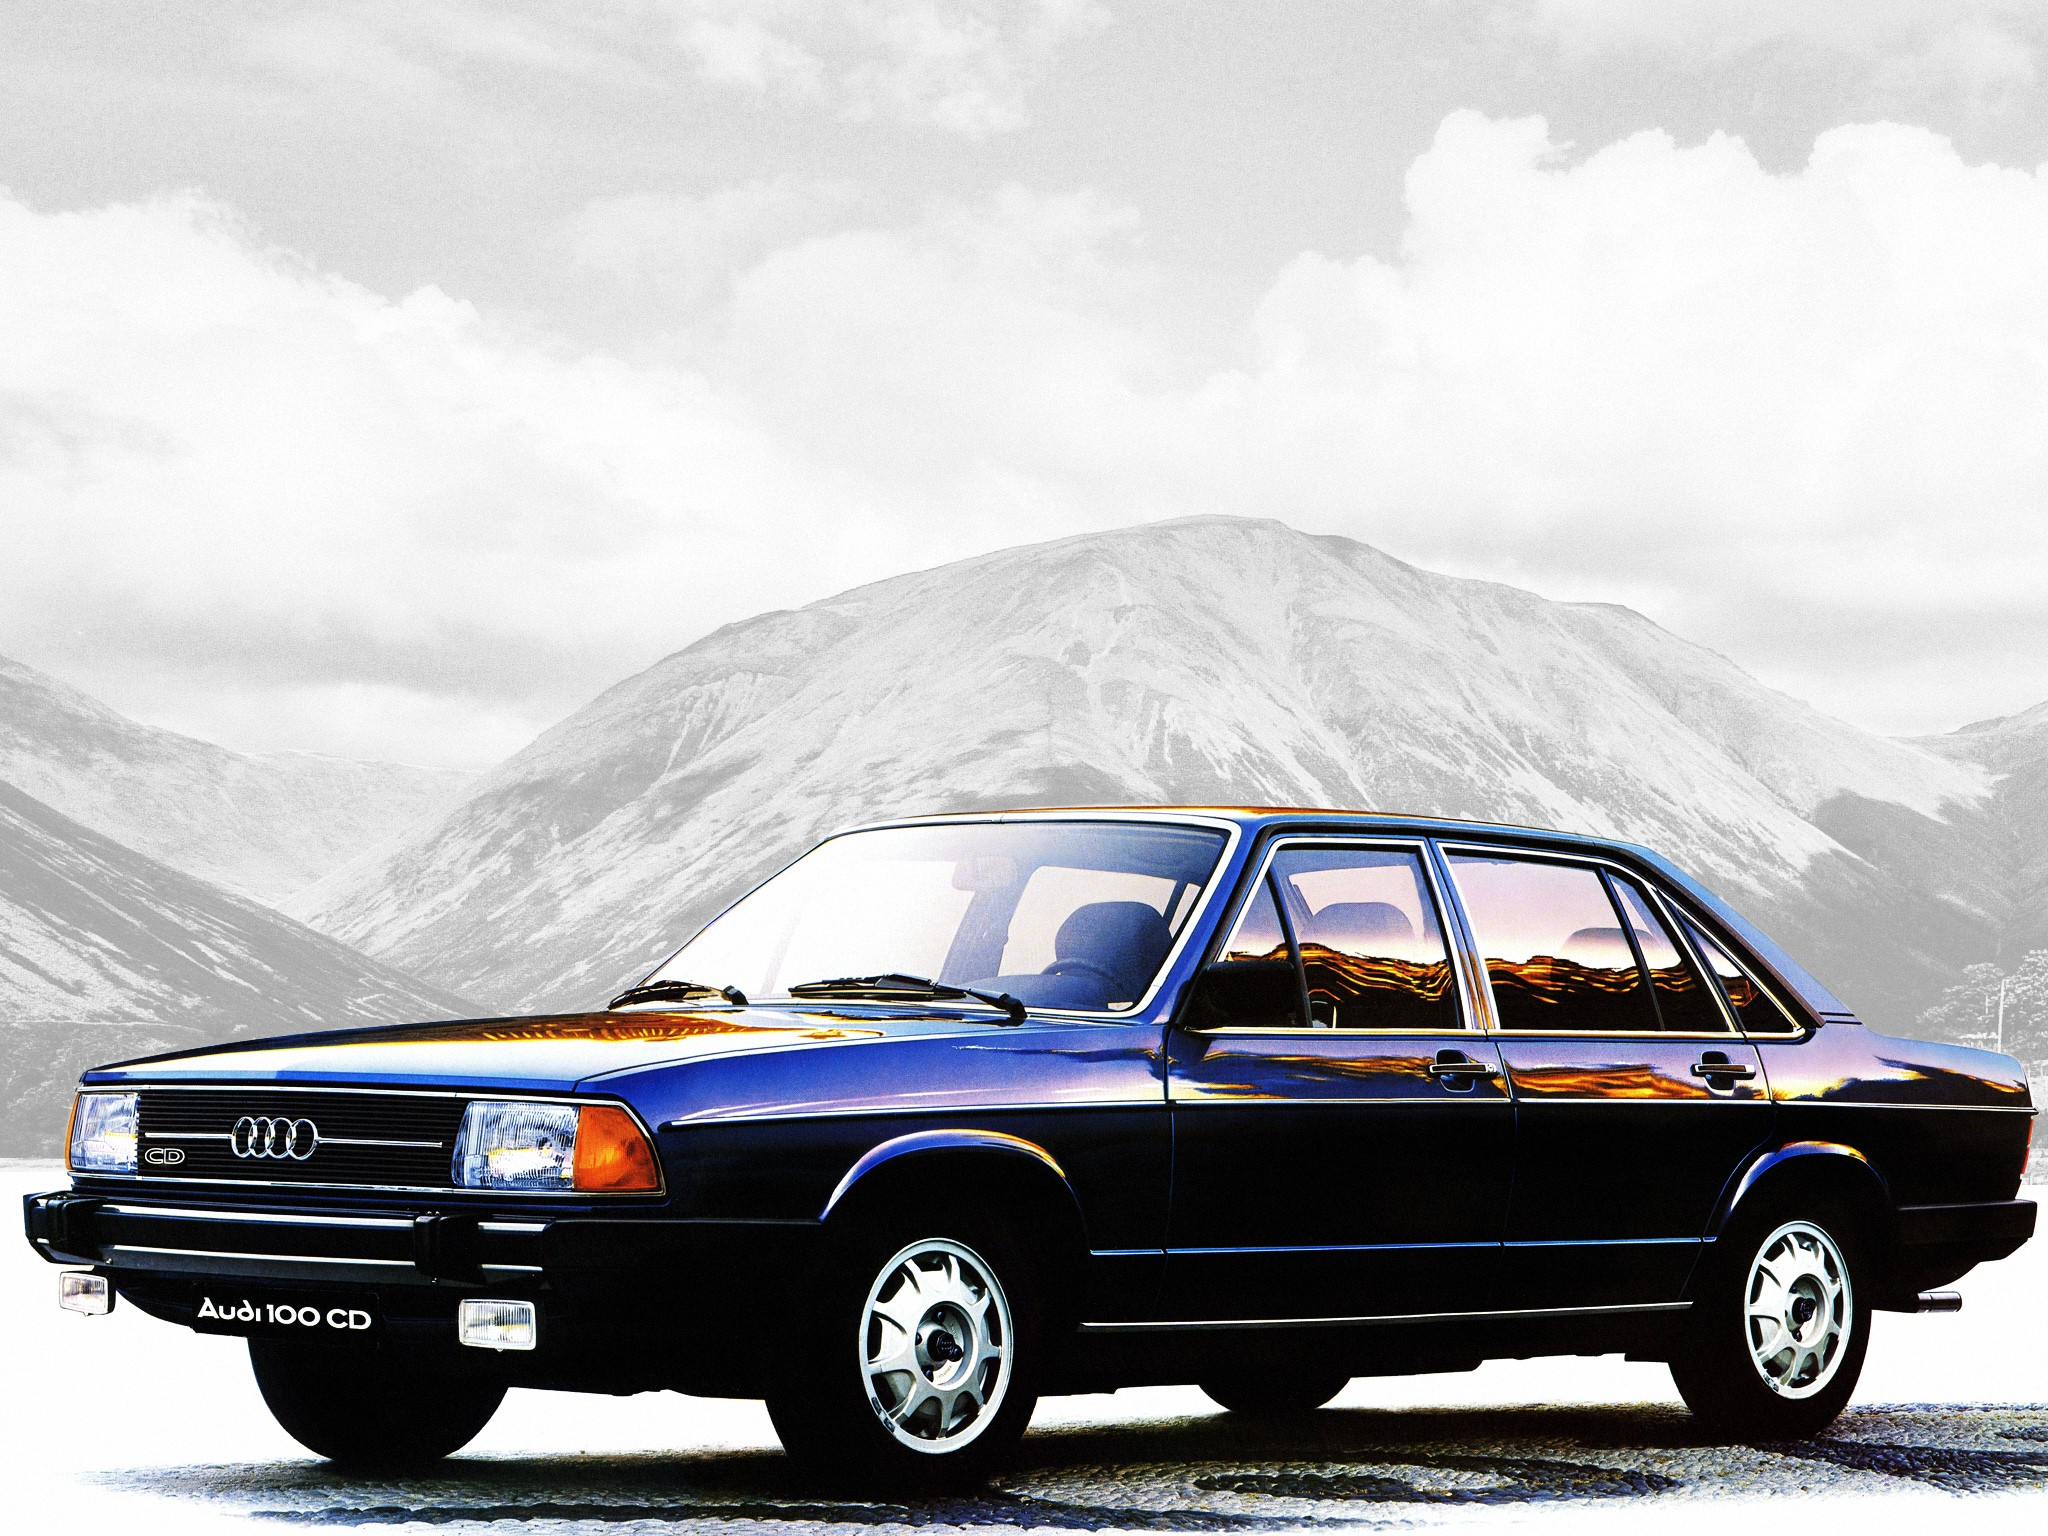 AUDI 100 (C2) - 1976, 1977, 1978, 1979, 1980, 1981, 1982 - autoevolution